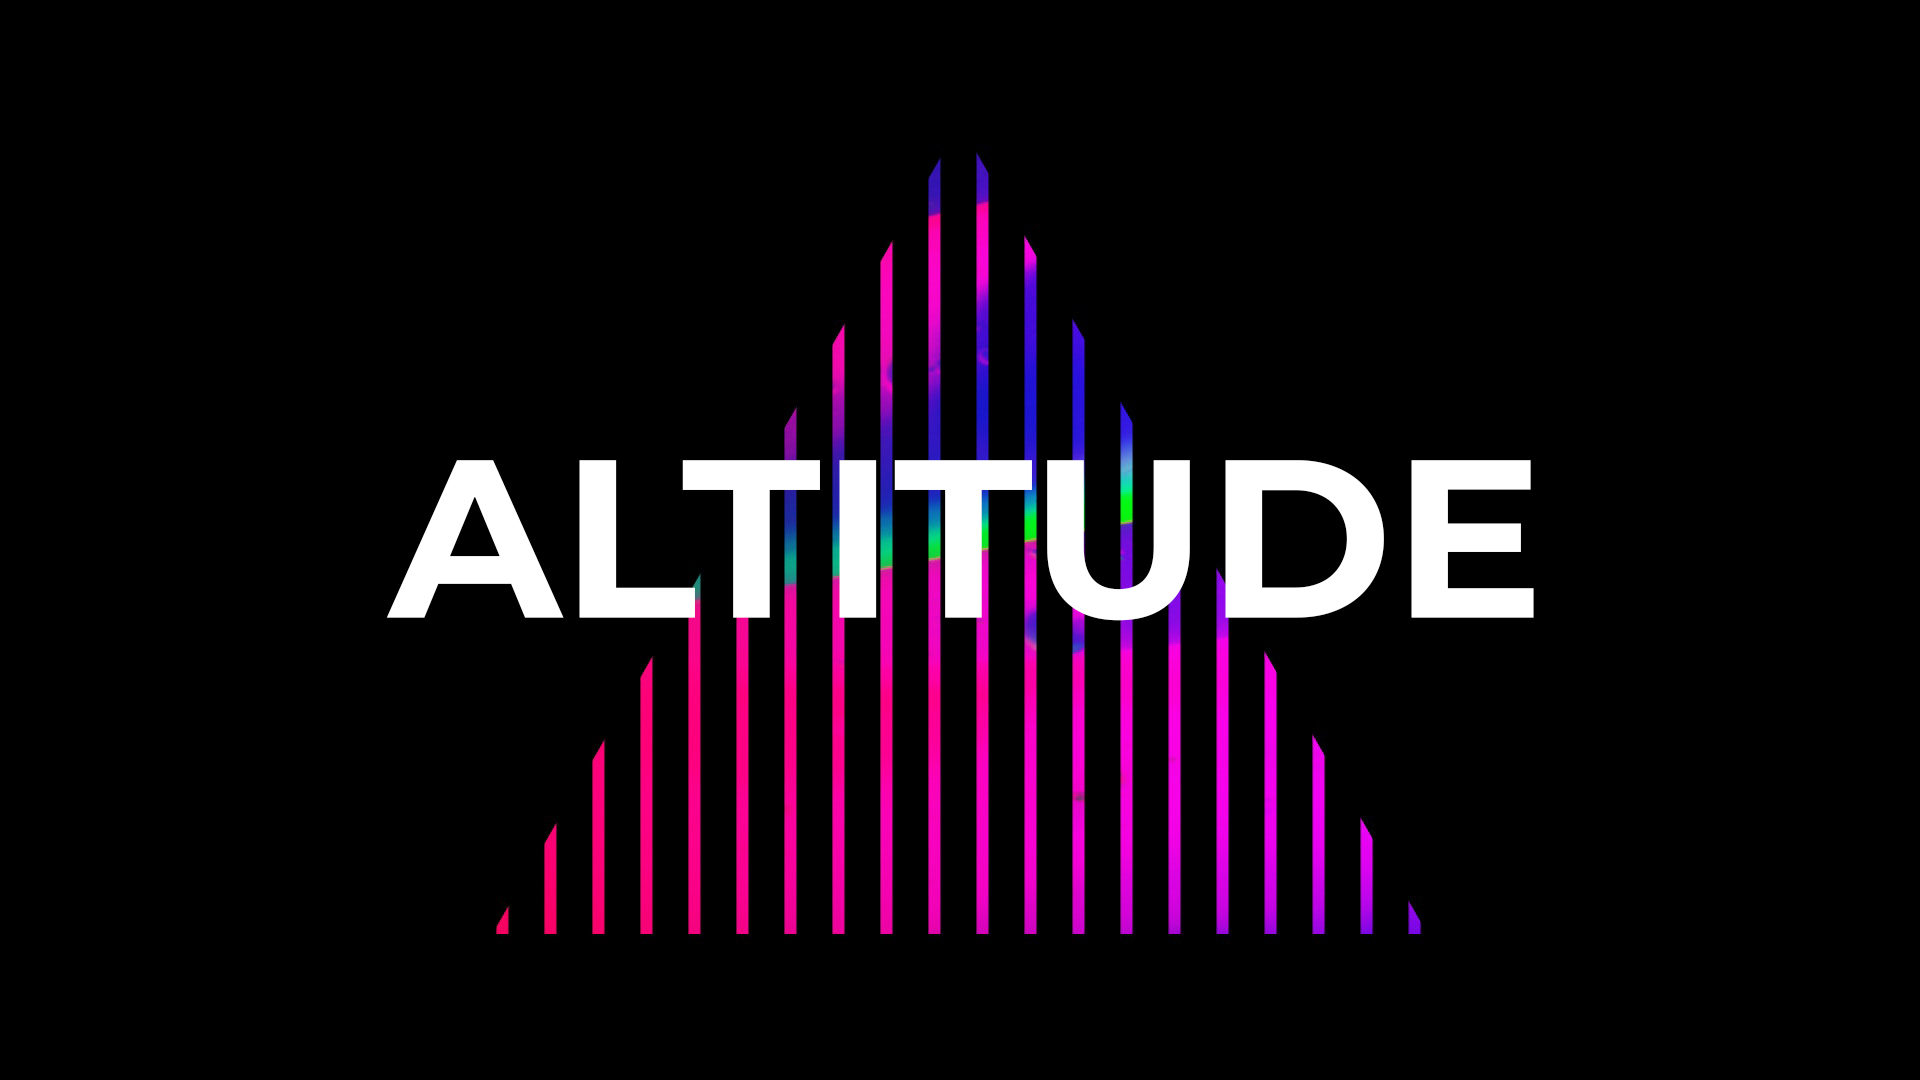 Altitude_Template Smaller.jpg